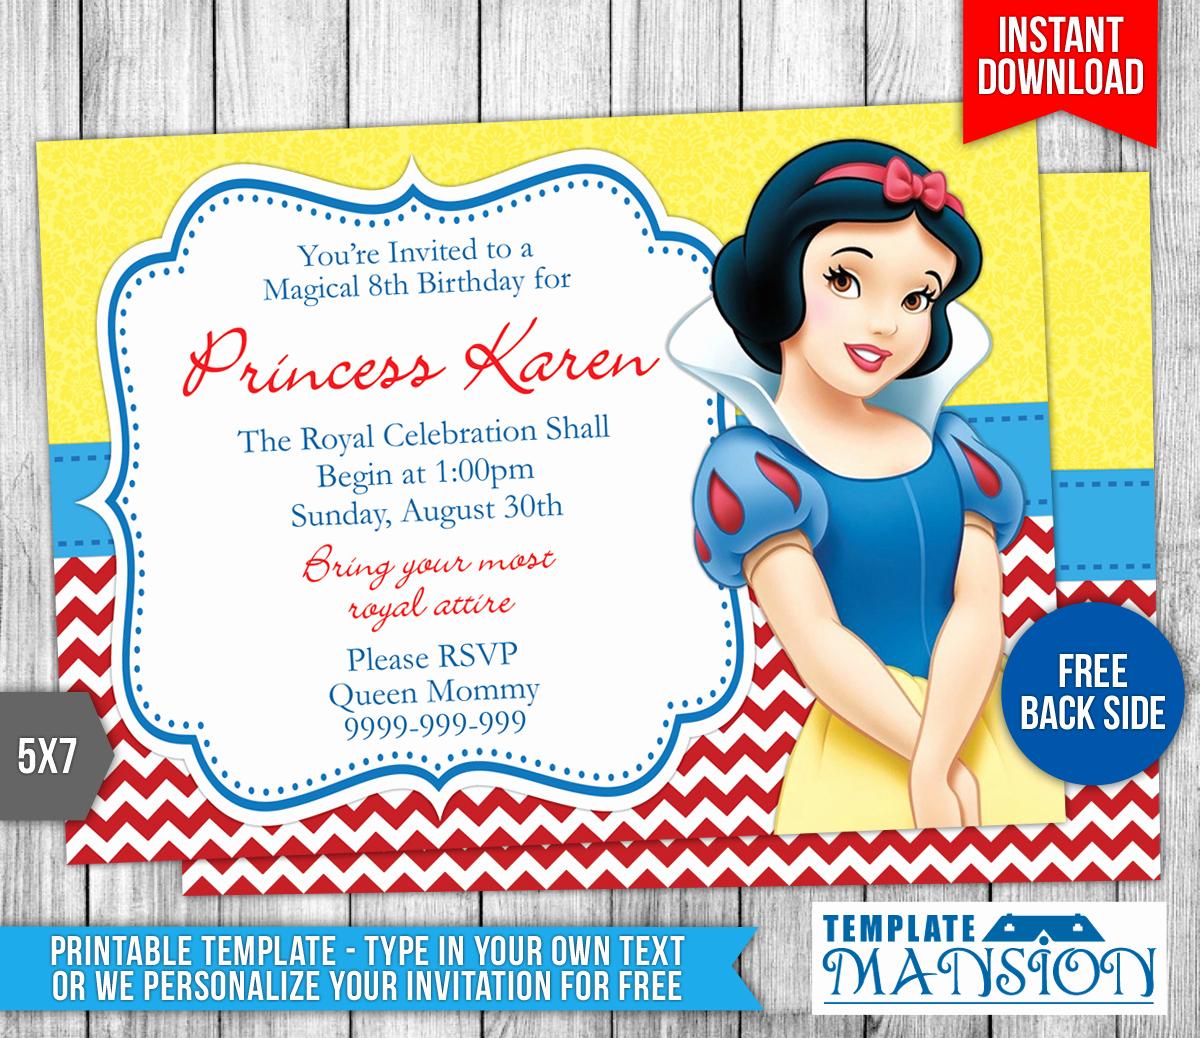 Snow White Invitation Template Luxury Snow White Birthday Invitation 2 by Templatemansion On